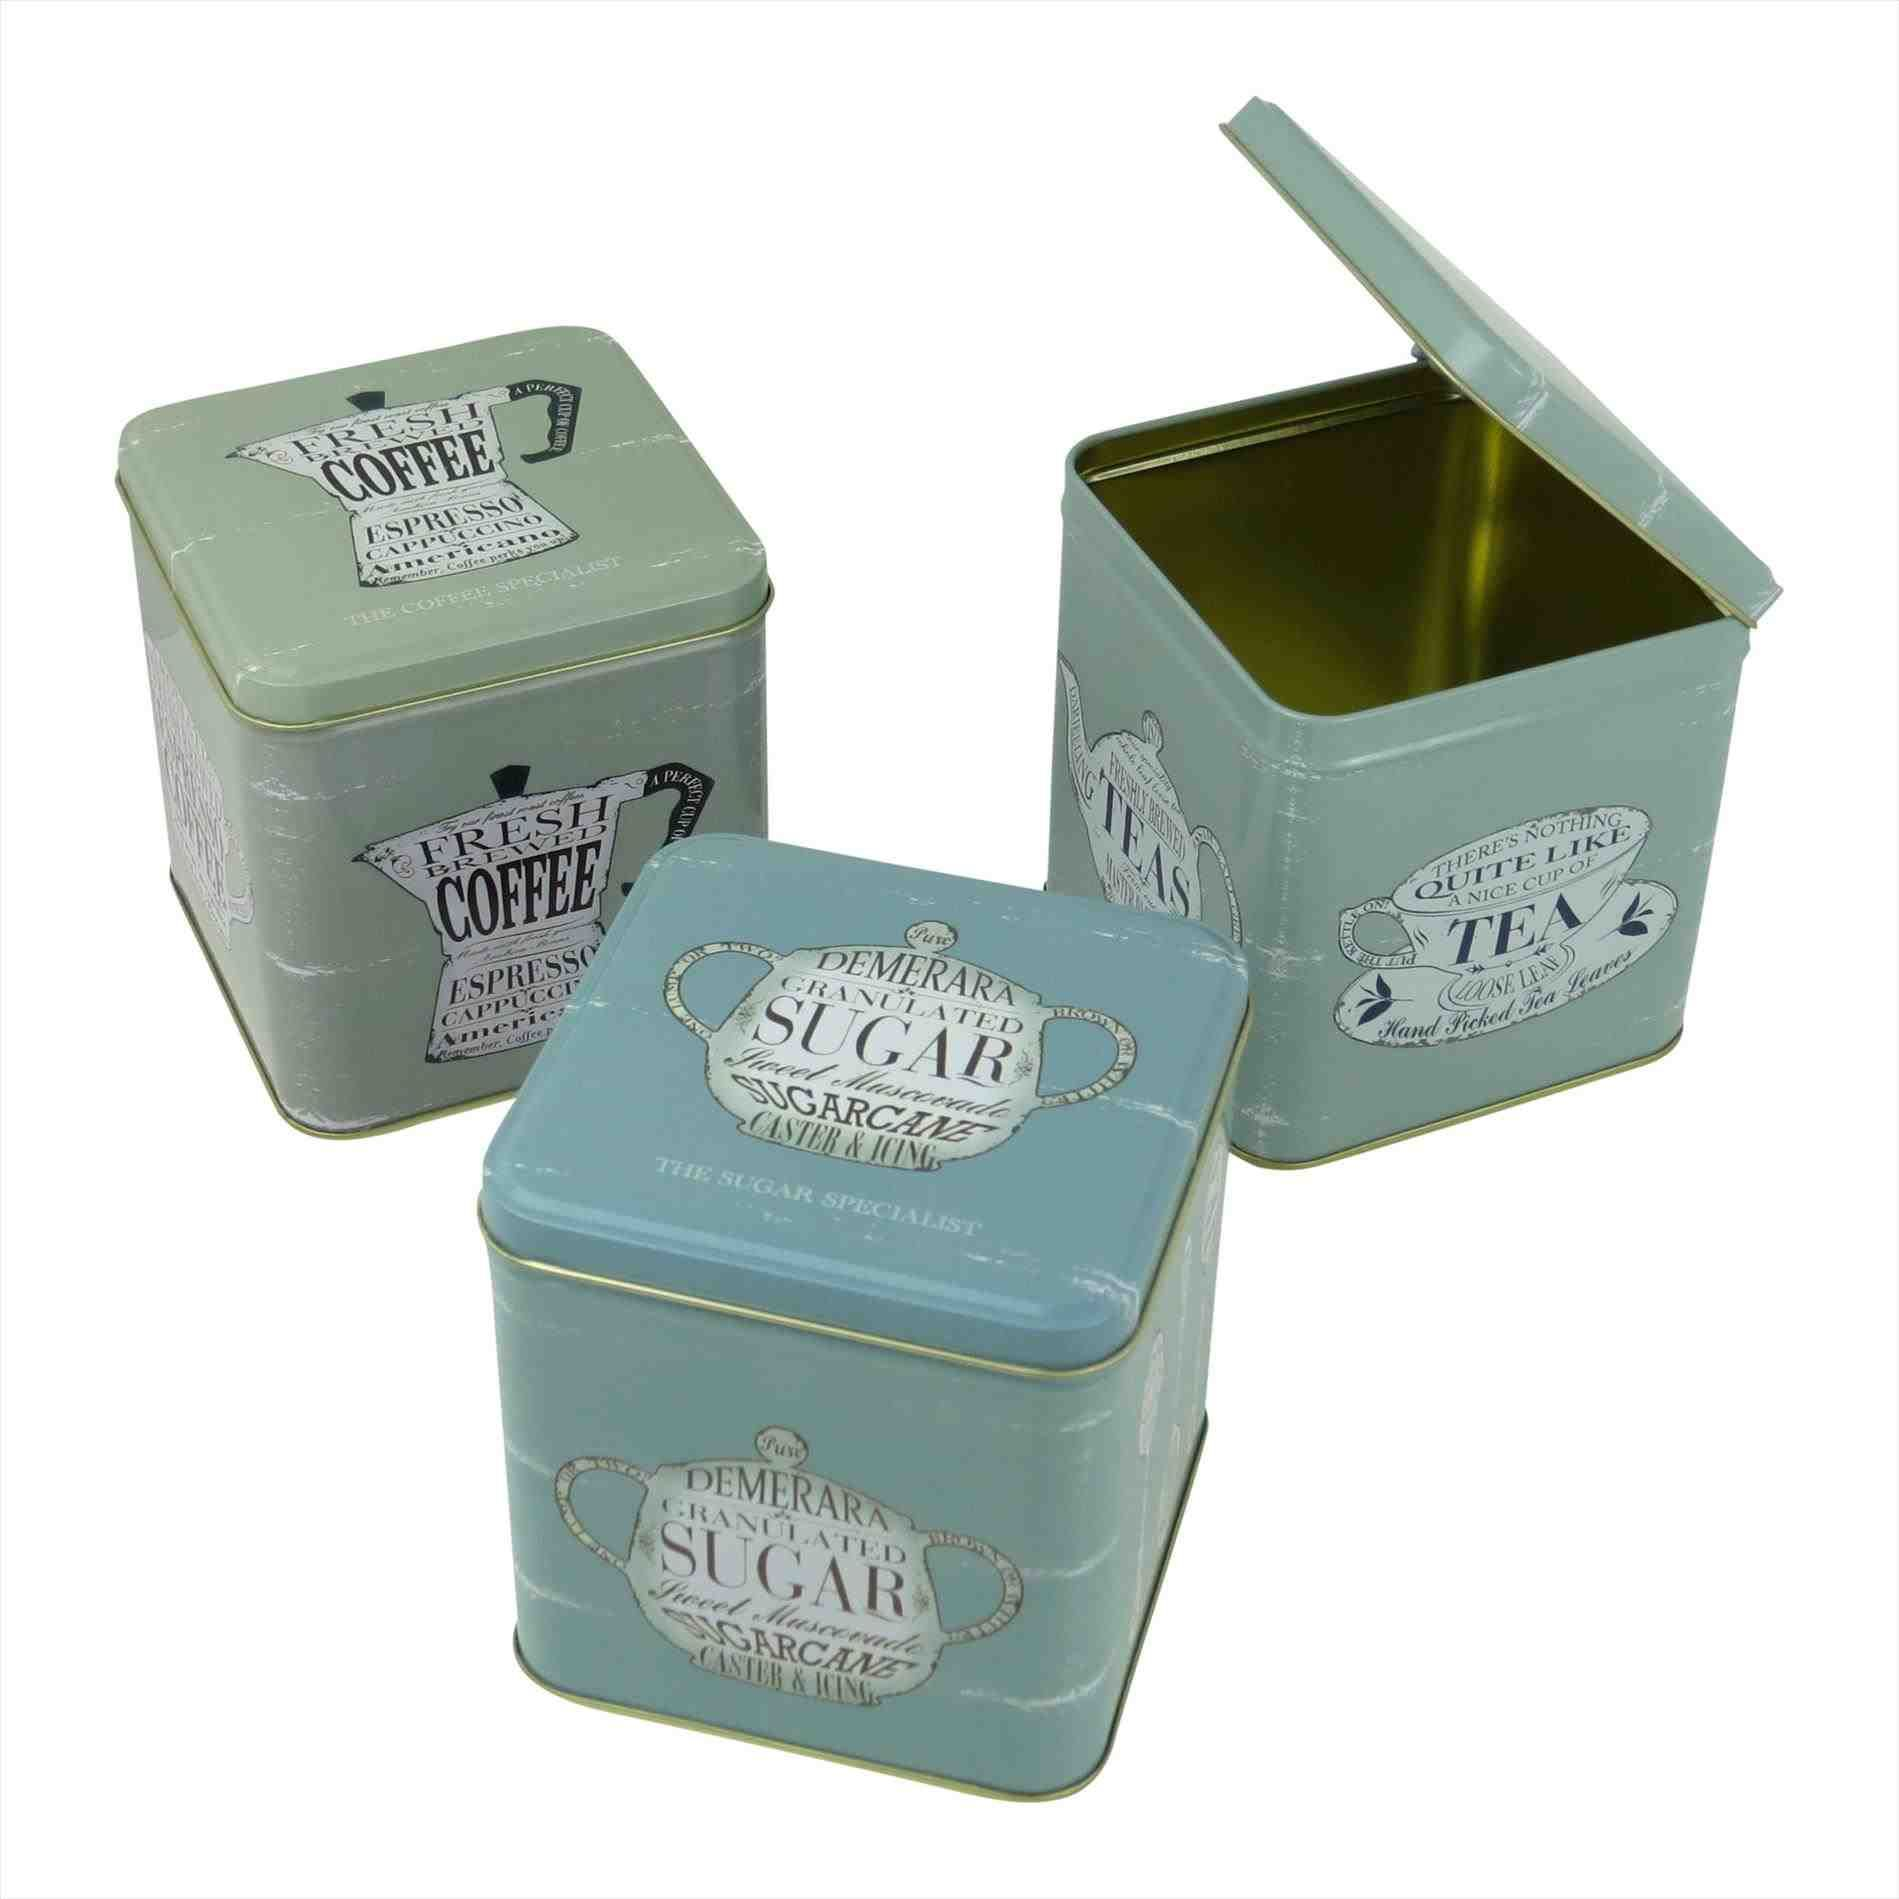 New Post black tea and coffee storage jars | Shabby chic | Pinterest ...